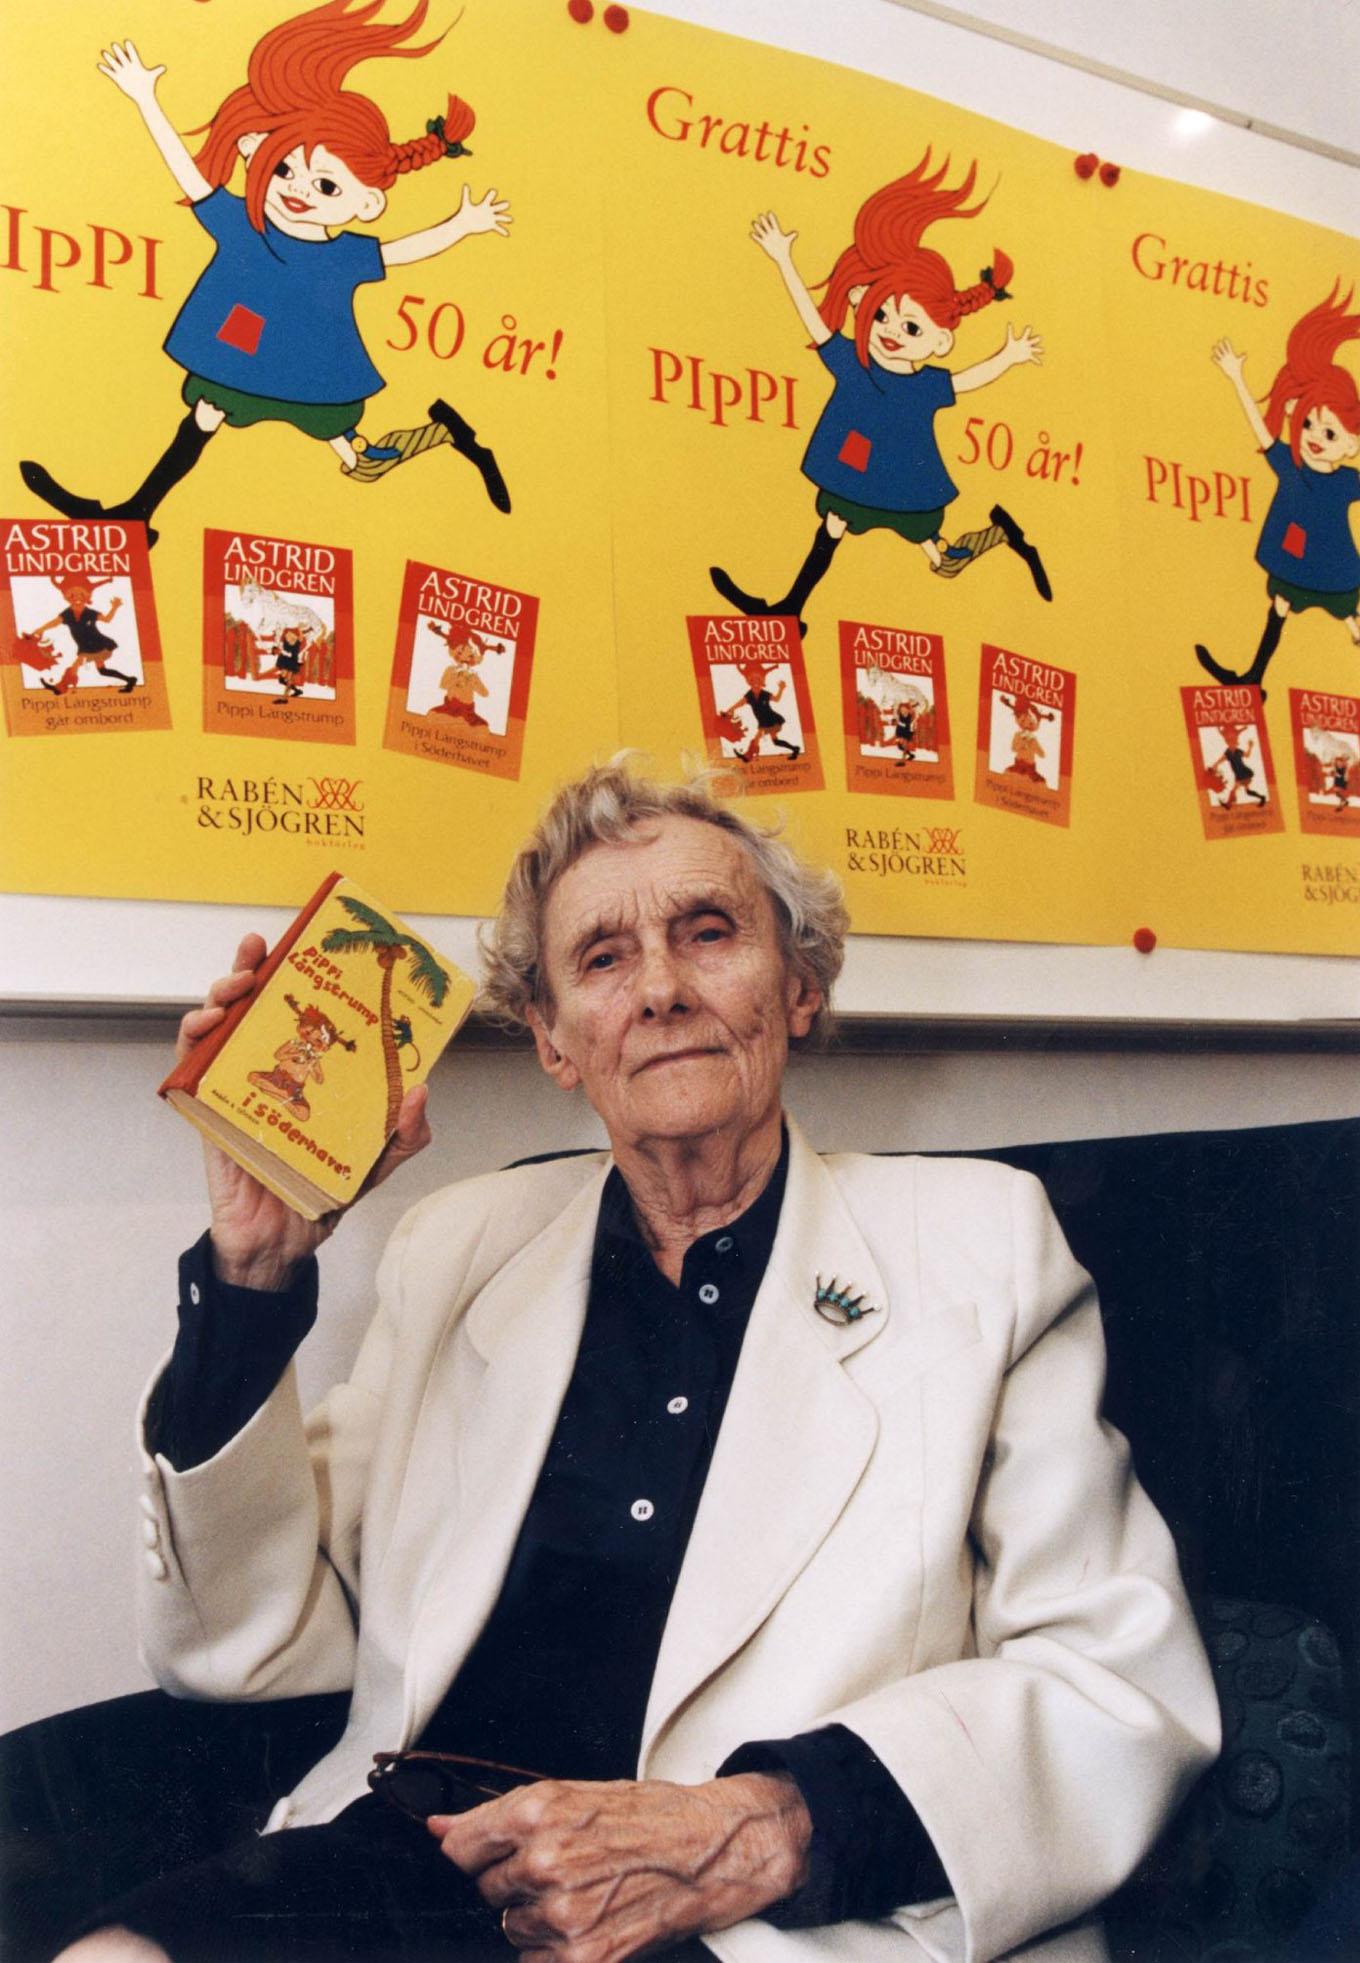 'Pippi Longstocking' to be made by 'Paddington' team